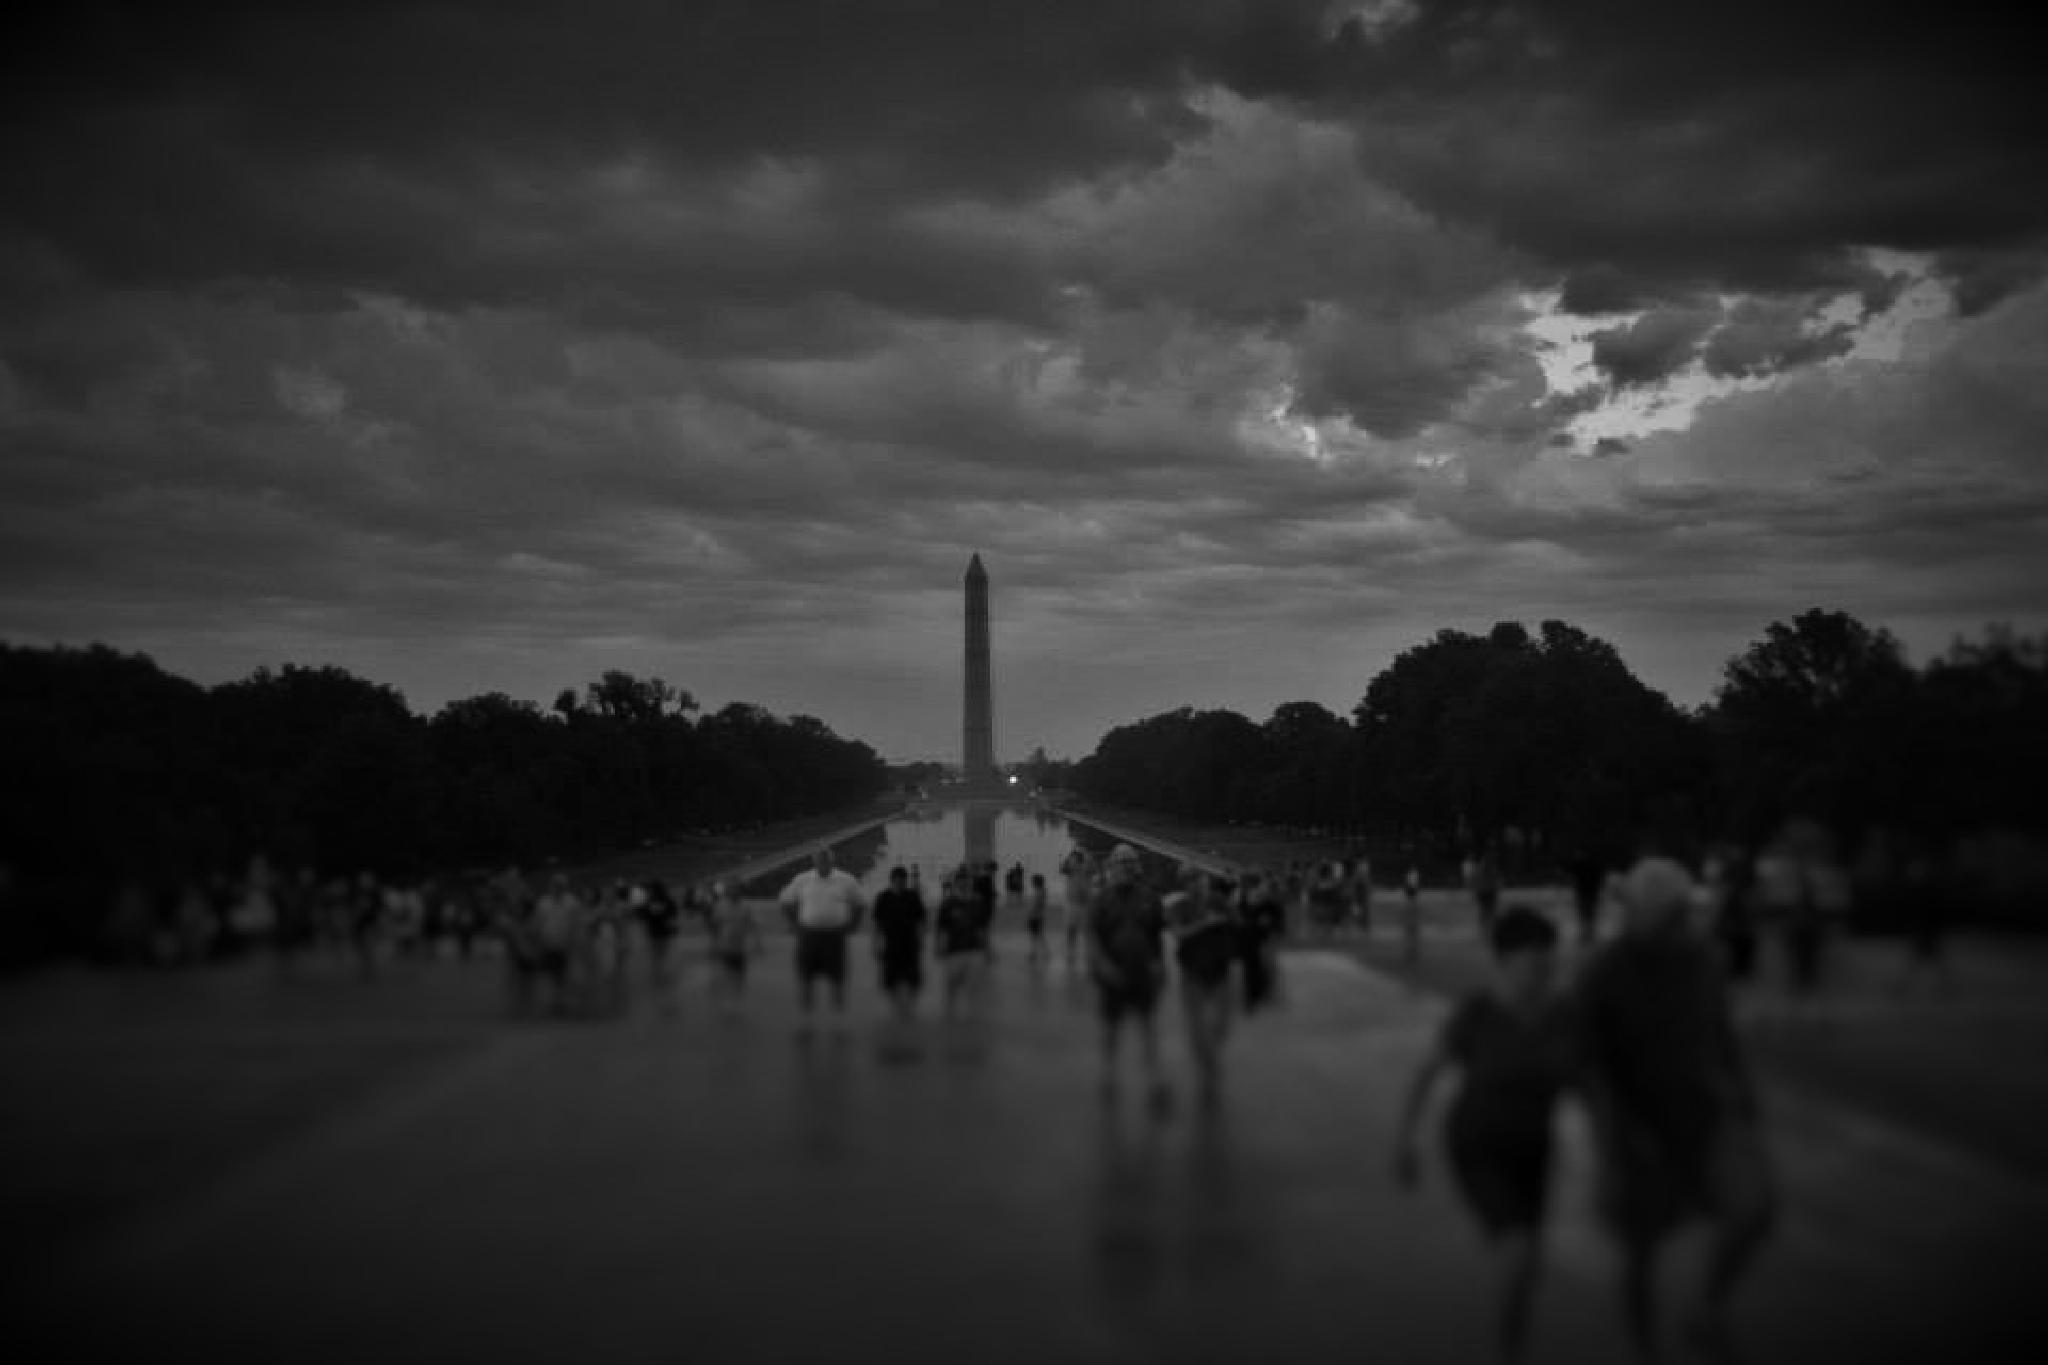 Clouds Over washington D.C. by brant.stevenson